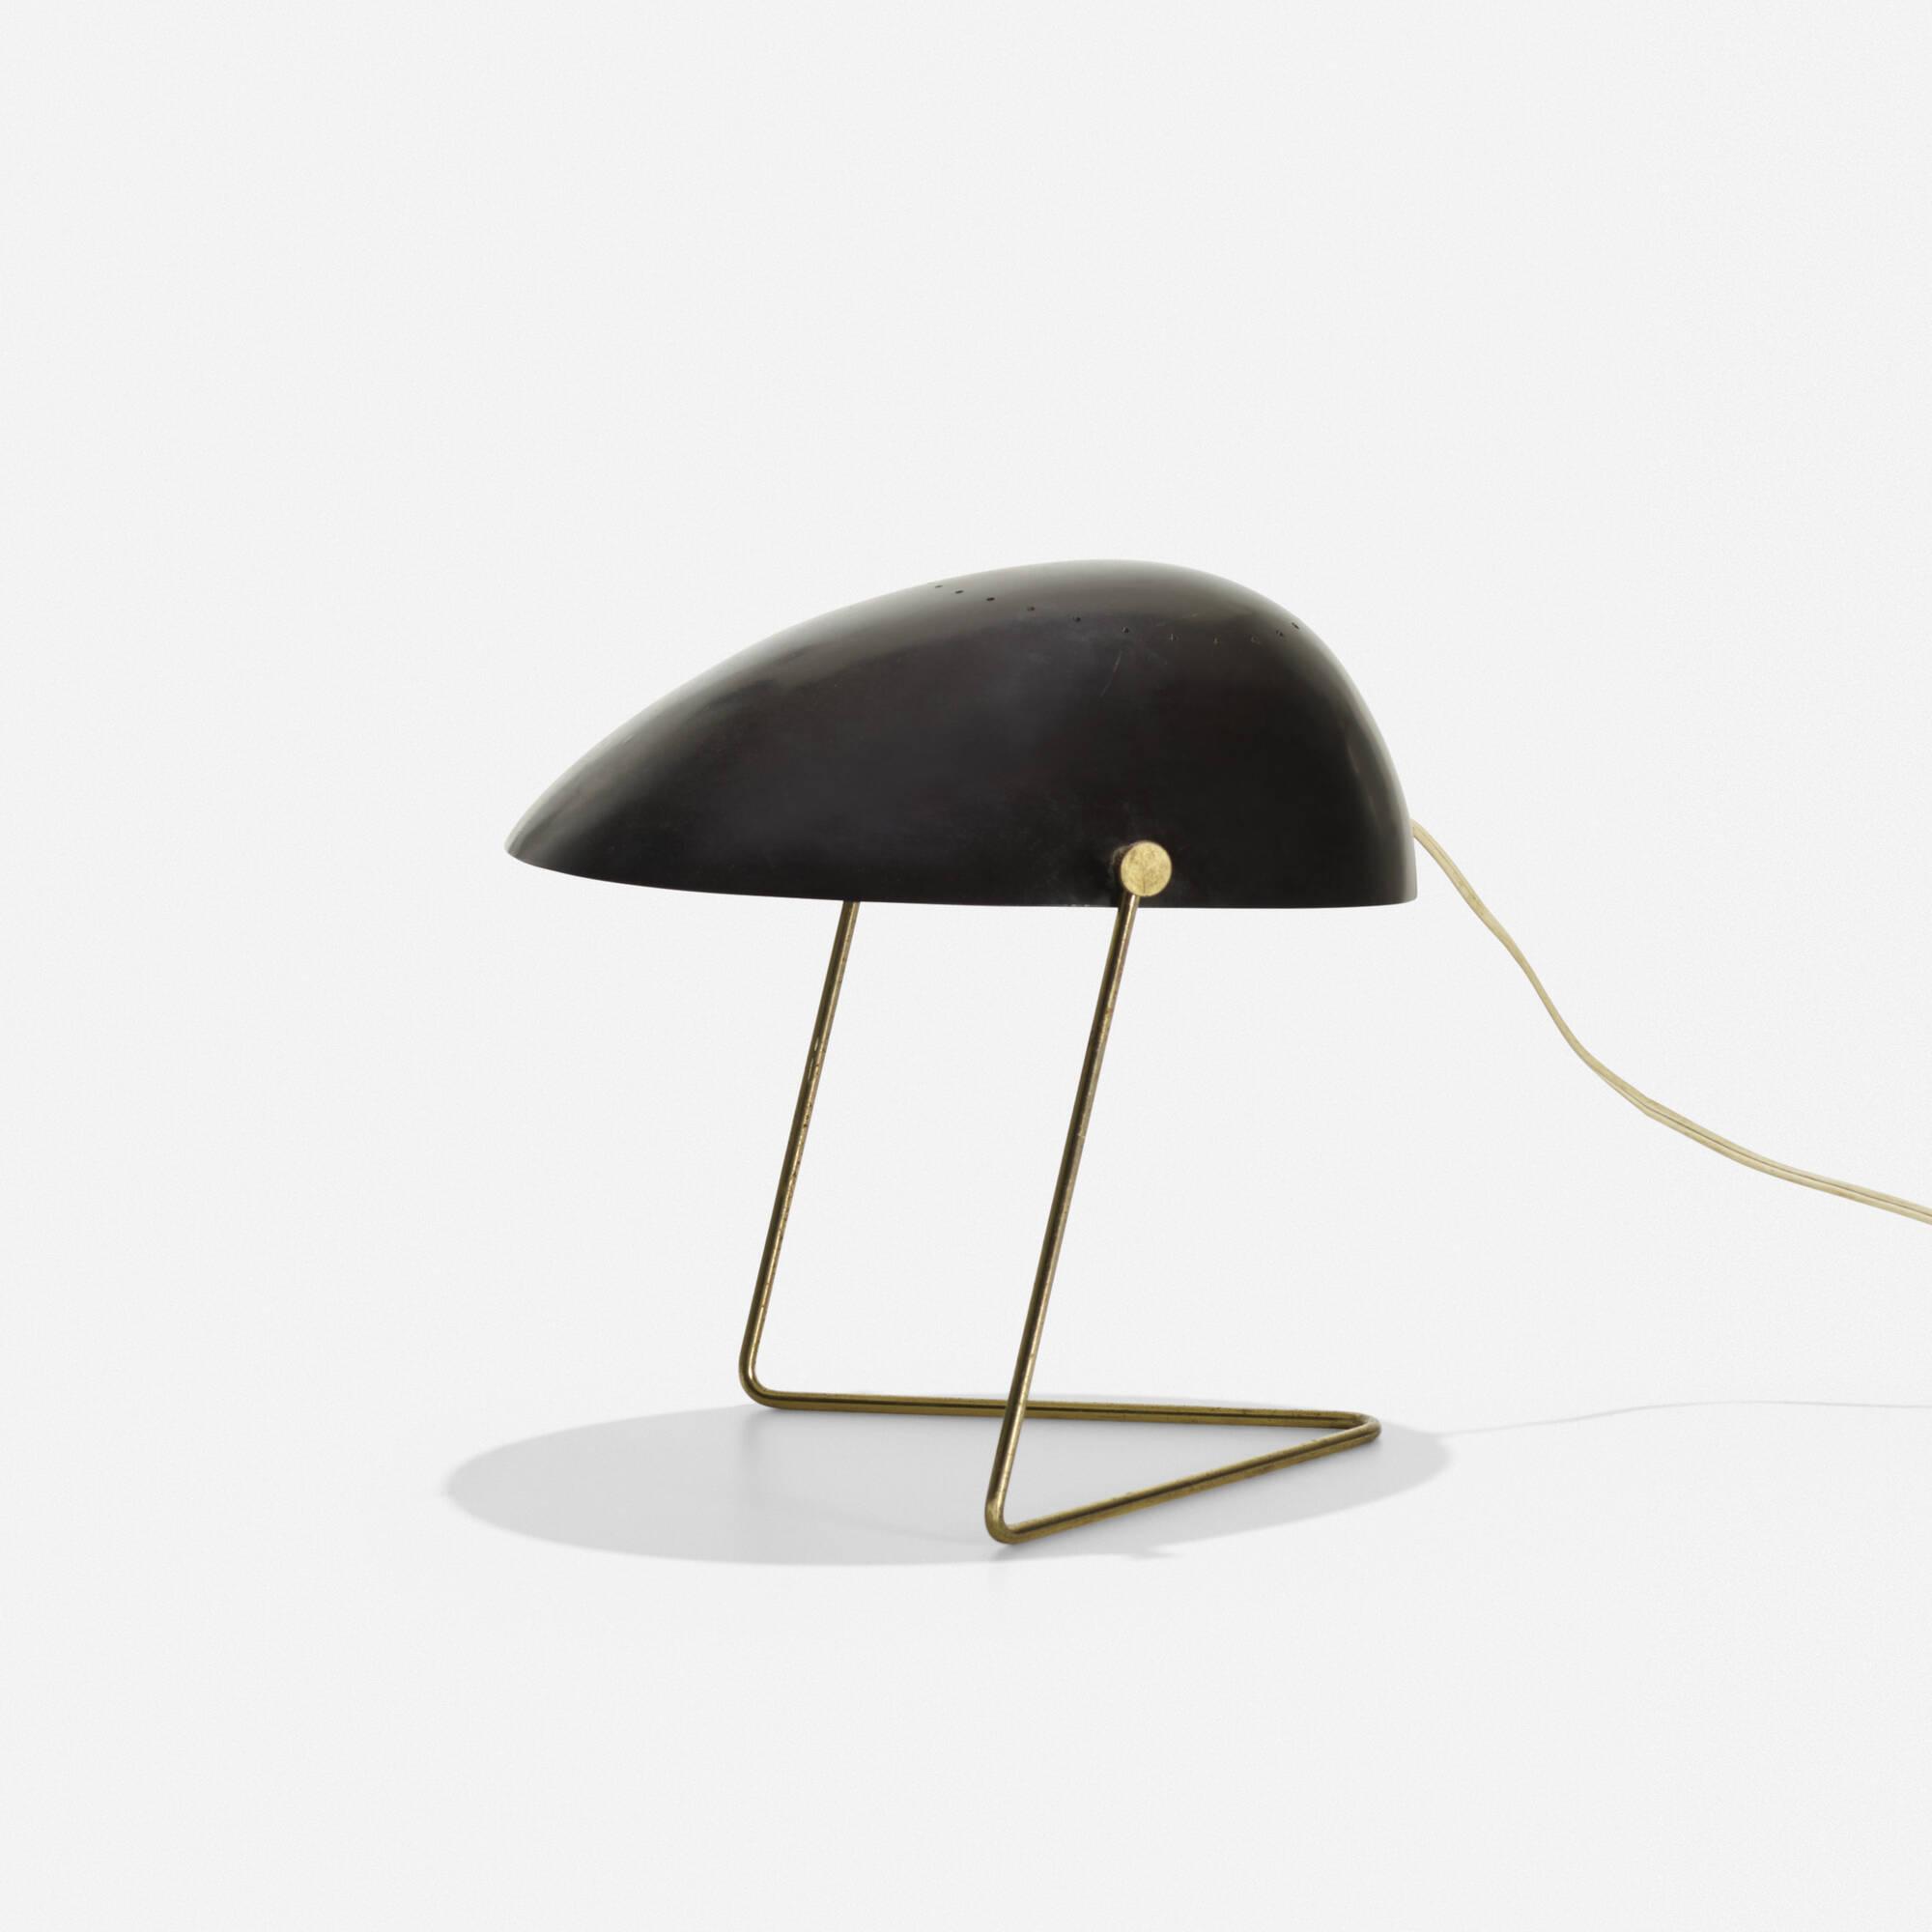 186: Gerald Thurston / table lamp (1 of 2)